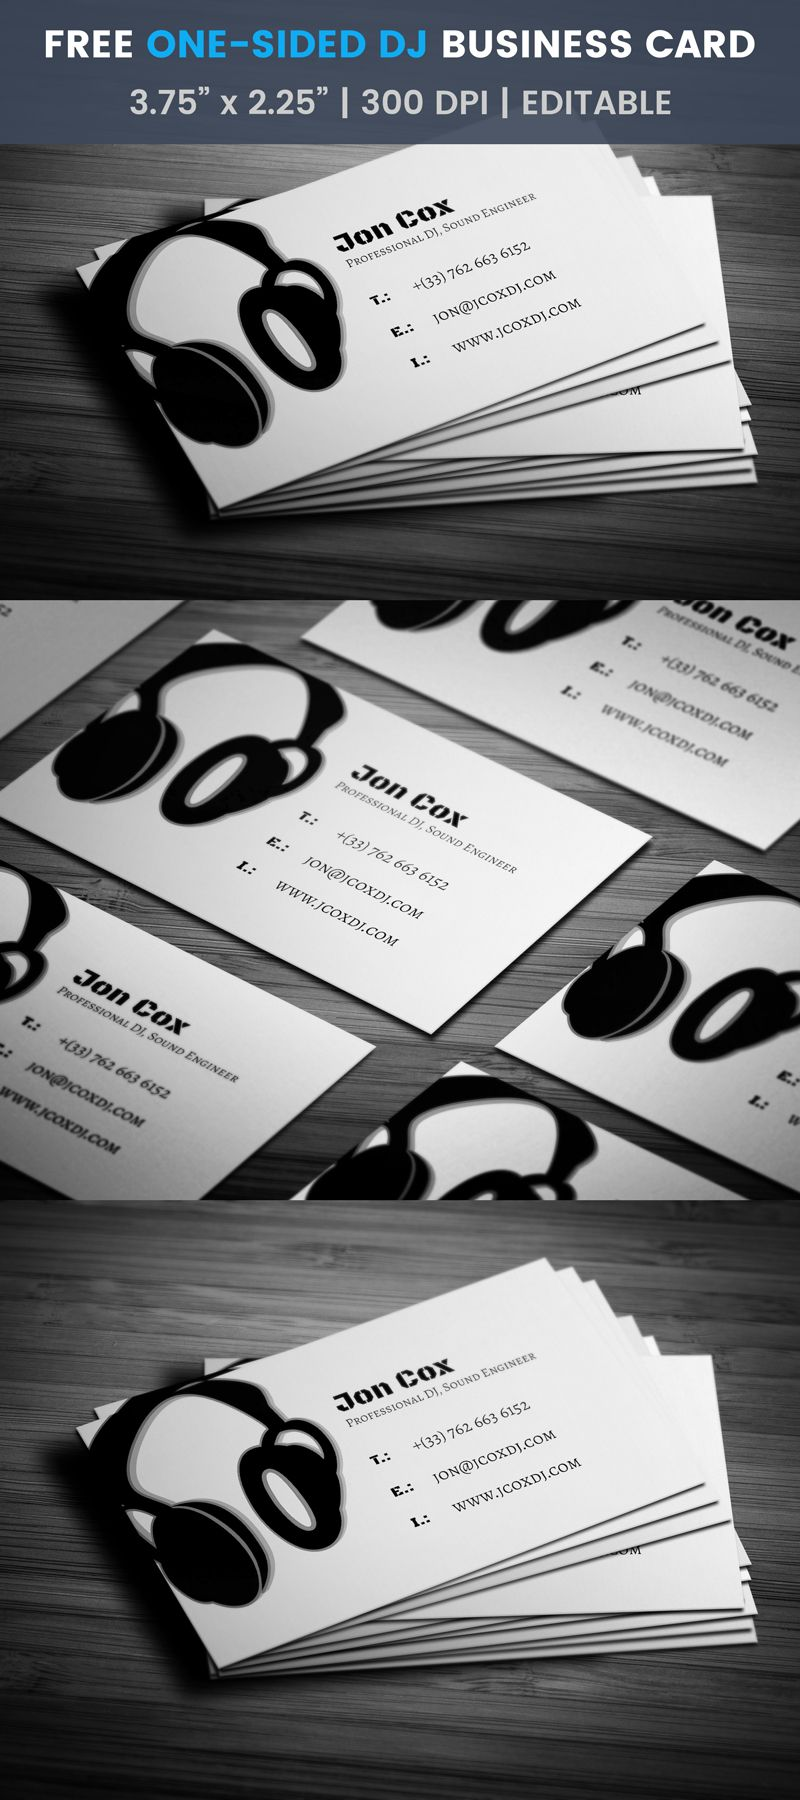 One Sided Sleek Dj Business Card Template Disco Dj Sound Dj Business Cards Printing Business Cards Free Business Card Templates